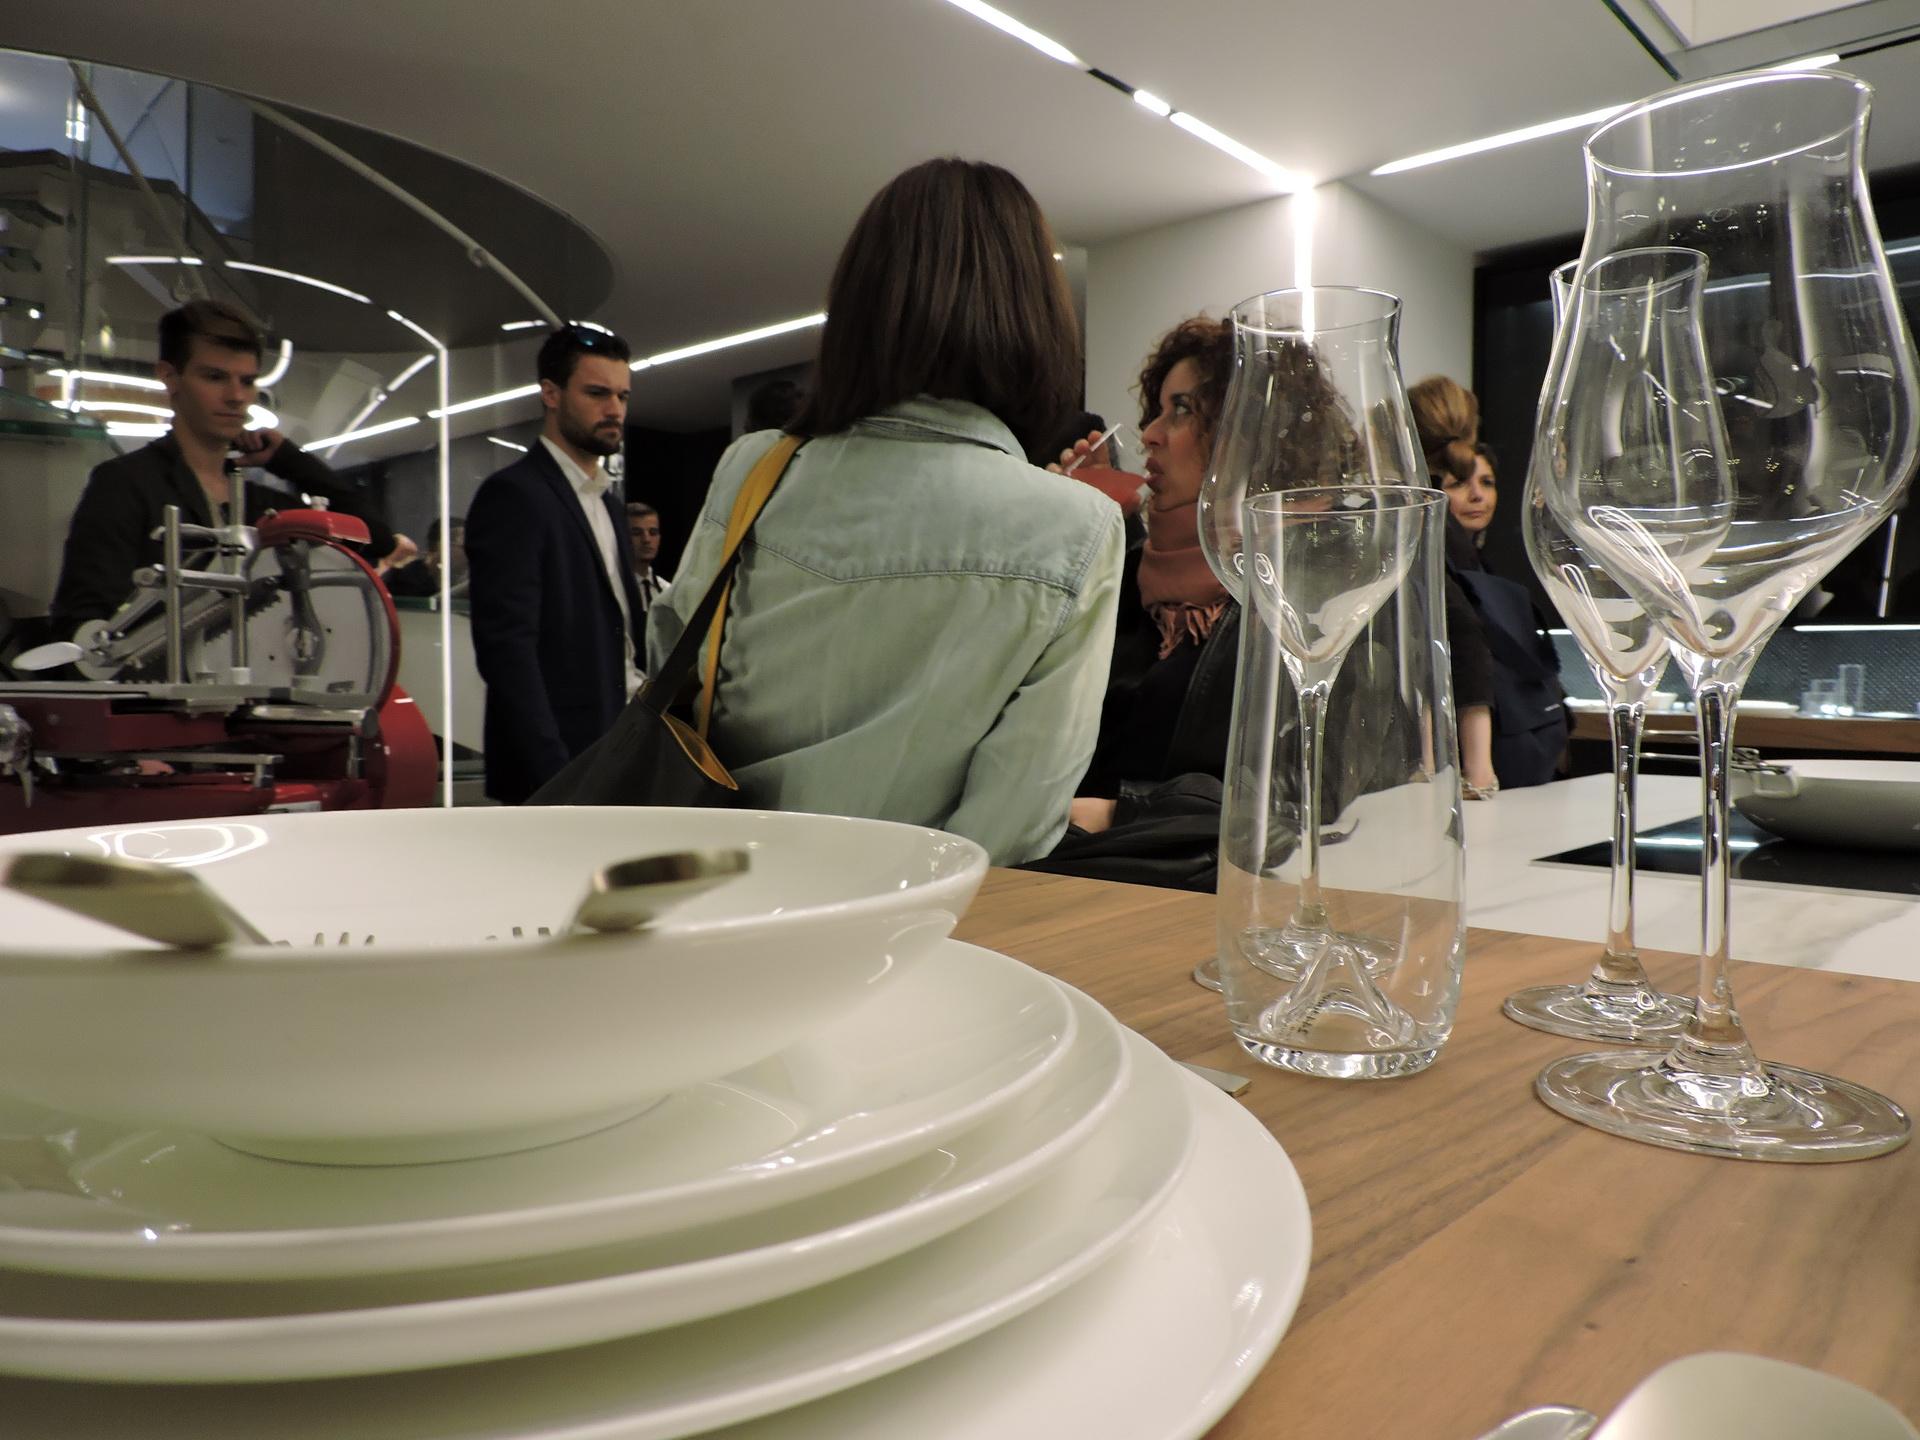 Fuorisalone 2017 - Desing Week 2017 - Binova Milano - cocktail con Davide Oldani e Schonhuber Franchi 023